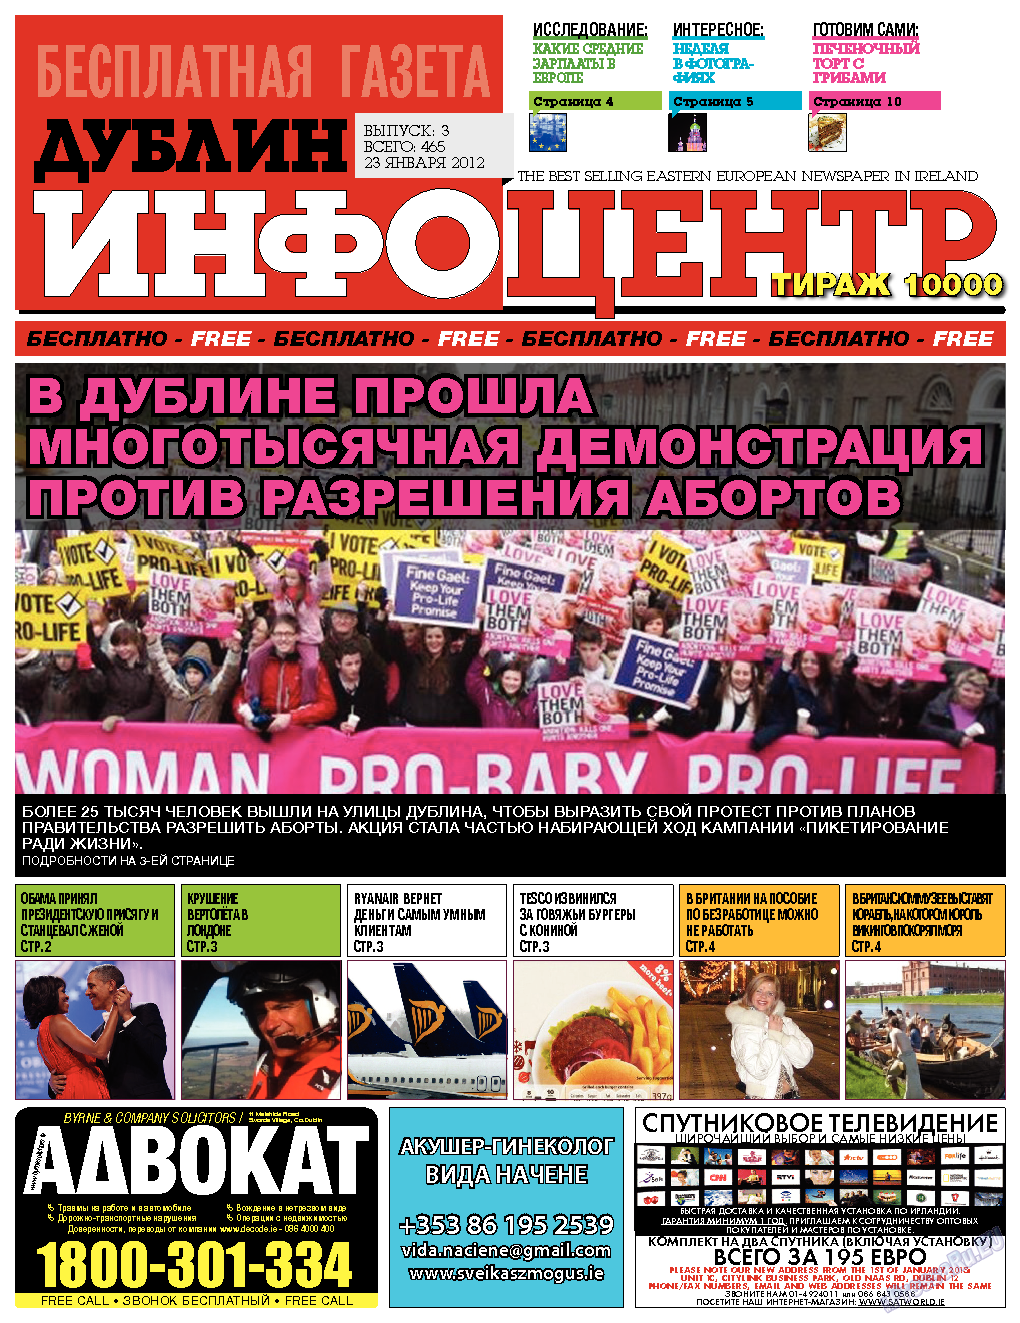 Дублин инфоцентр (газета). 2013 год, номер 3, стр. 1